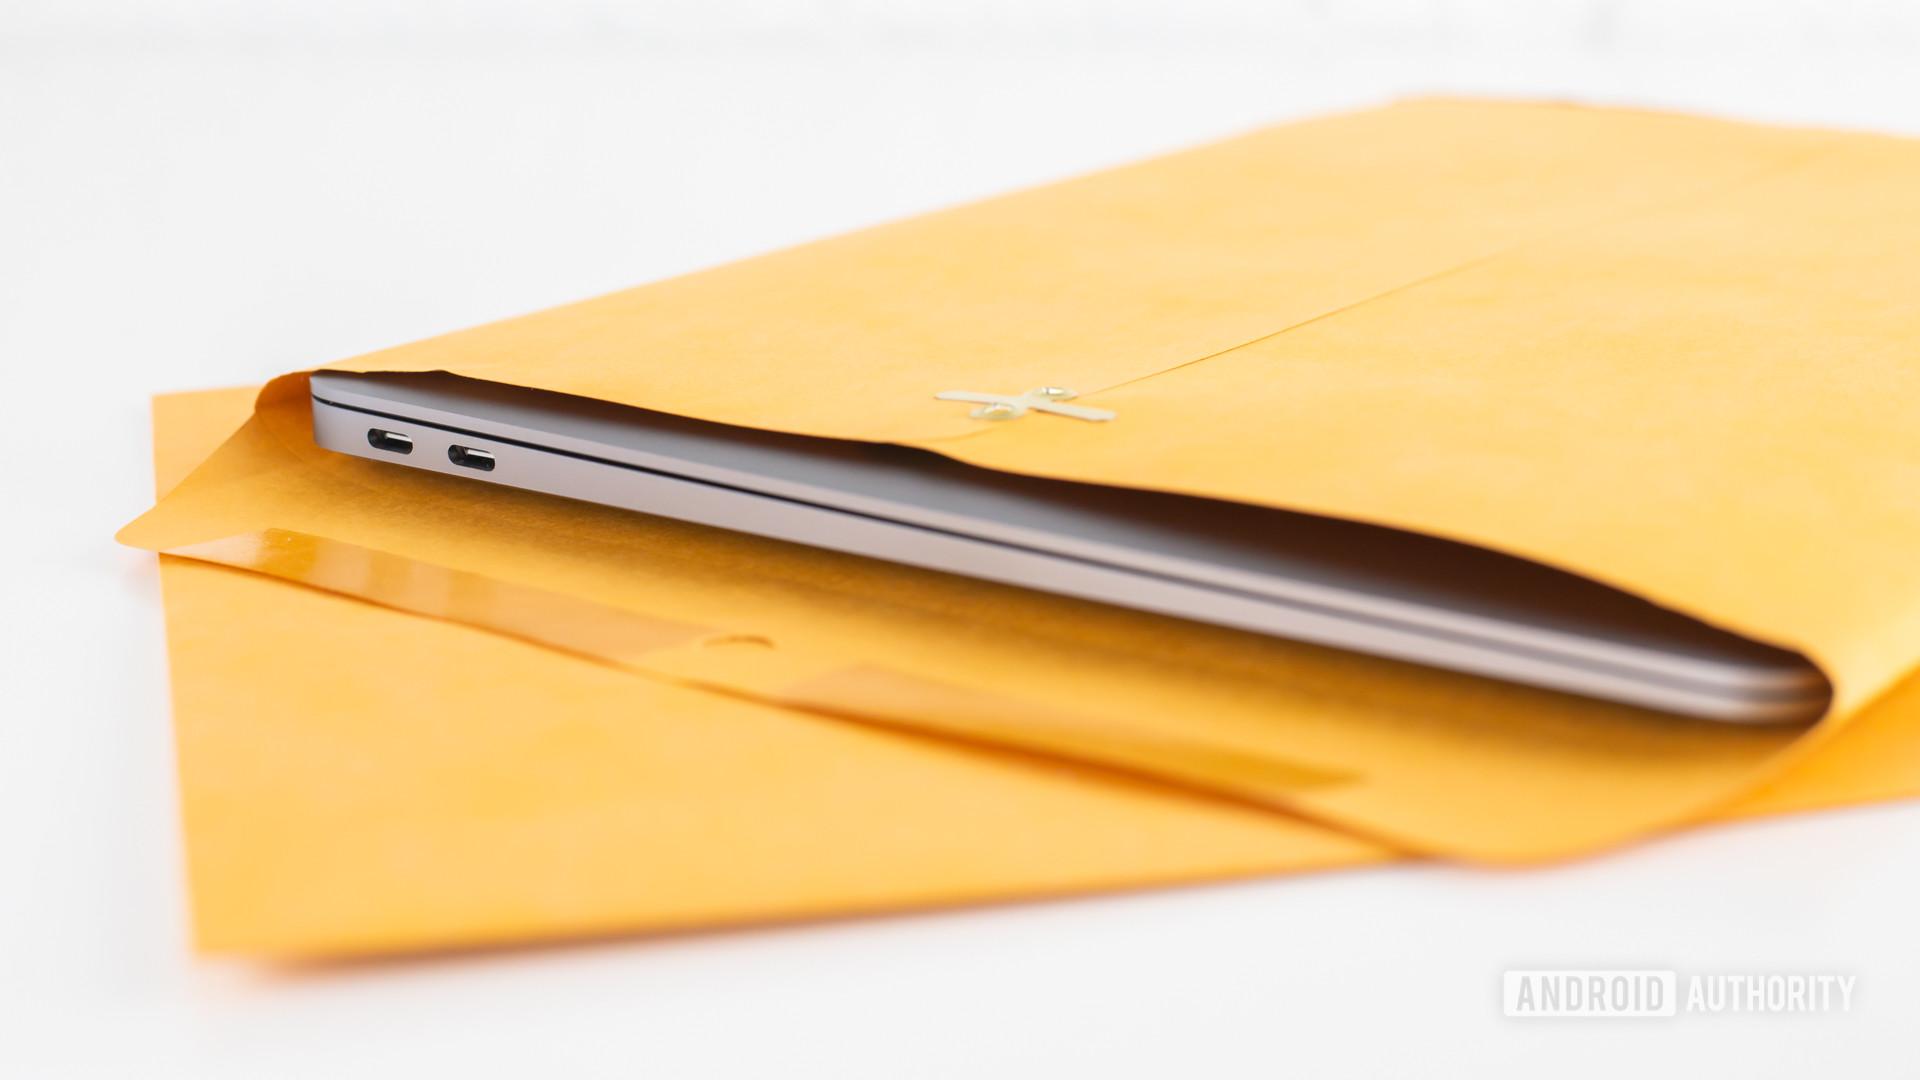 2020 MacBook Air review laptop inside manila envelope5